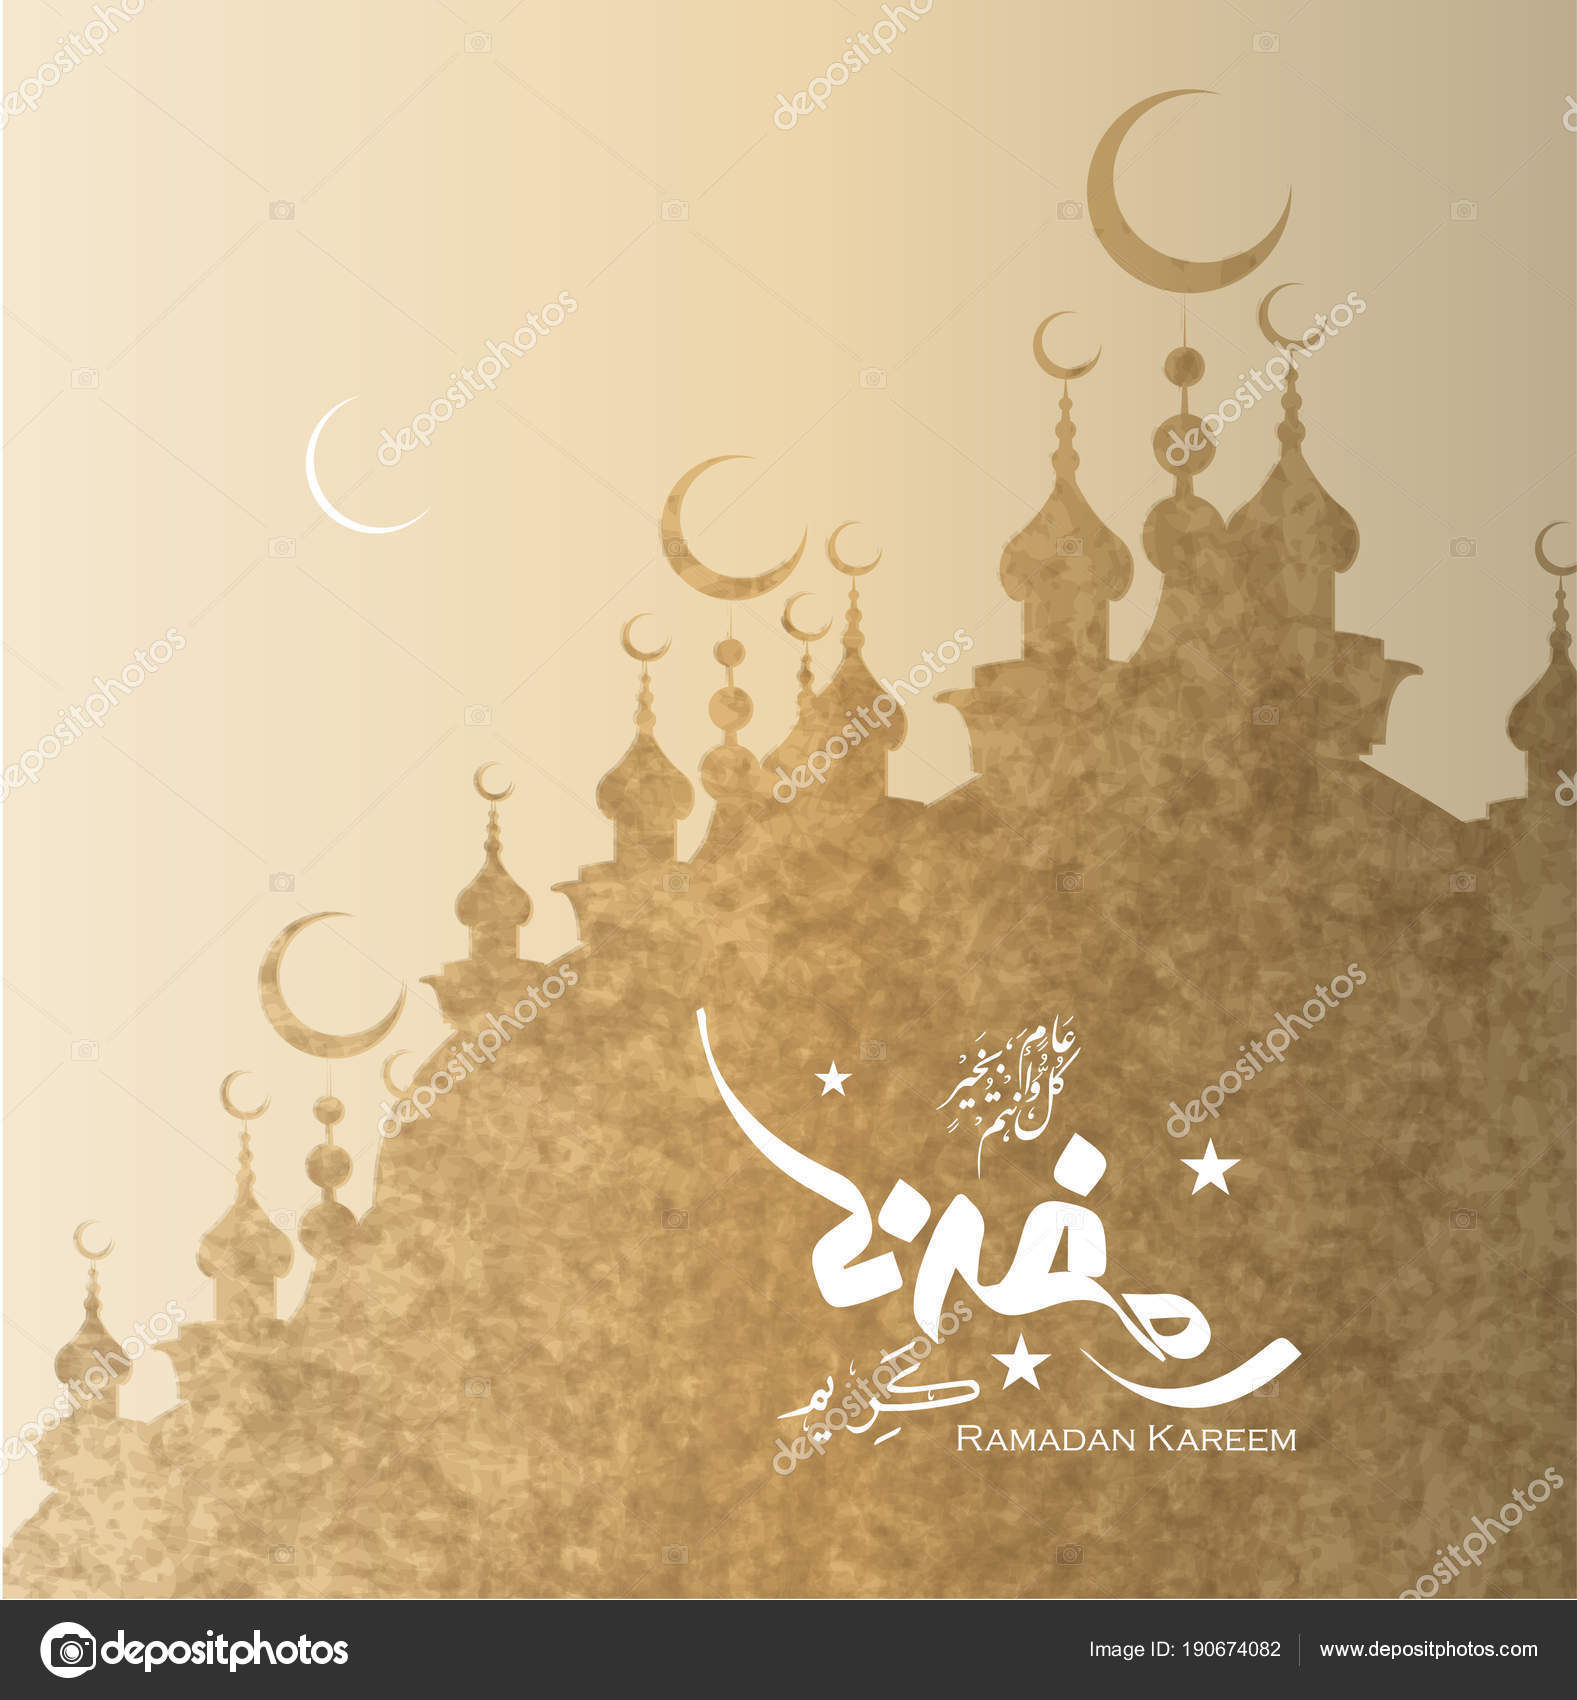 Ramadan kareem mubarak greeting cards arabic calligraphy translation ramadan kareem mubarak greeting cards with arabic calligraphy translation generous ramadhan ramazan is holy fasting month for muslim stock vector m4hsunfo